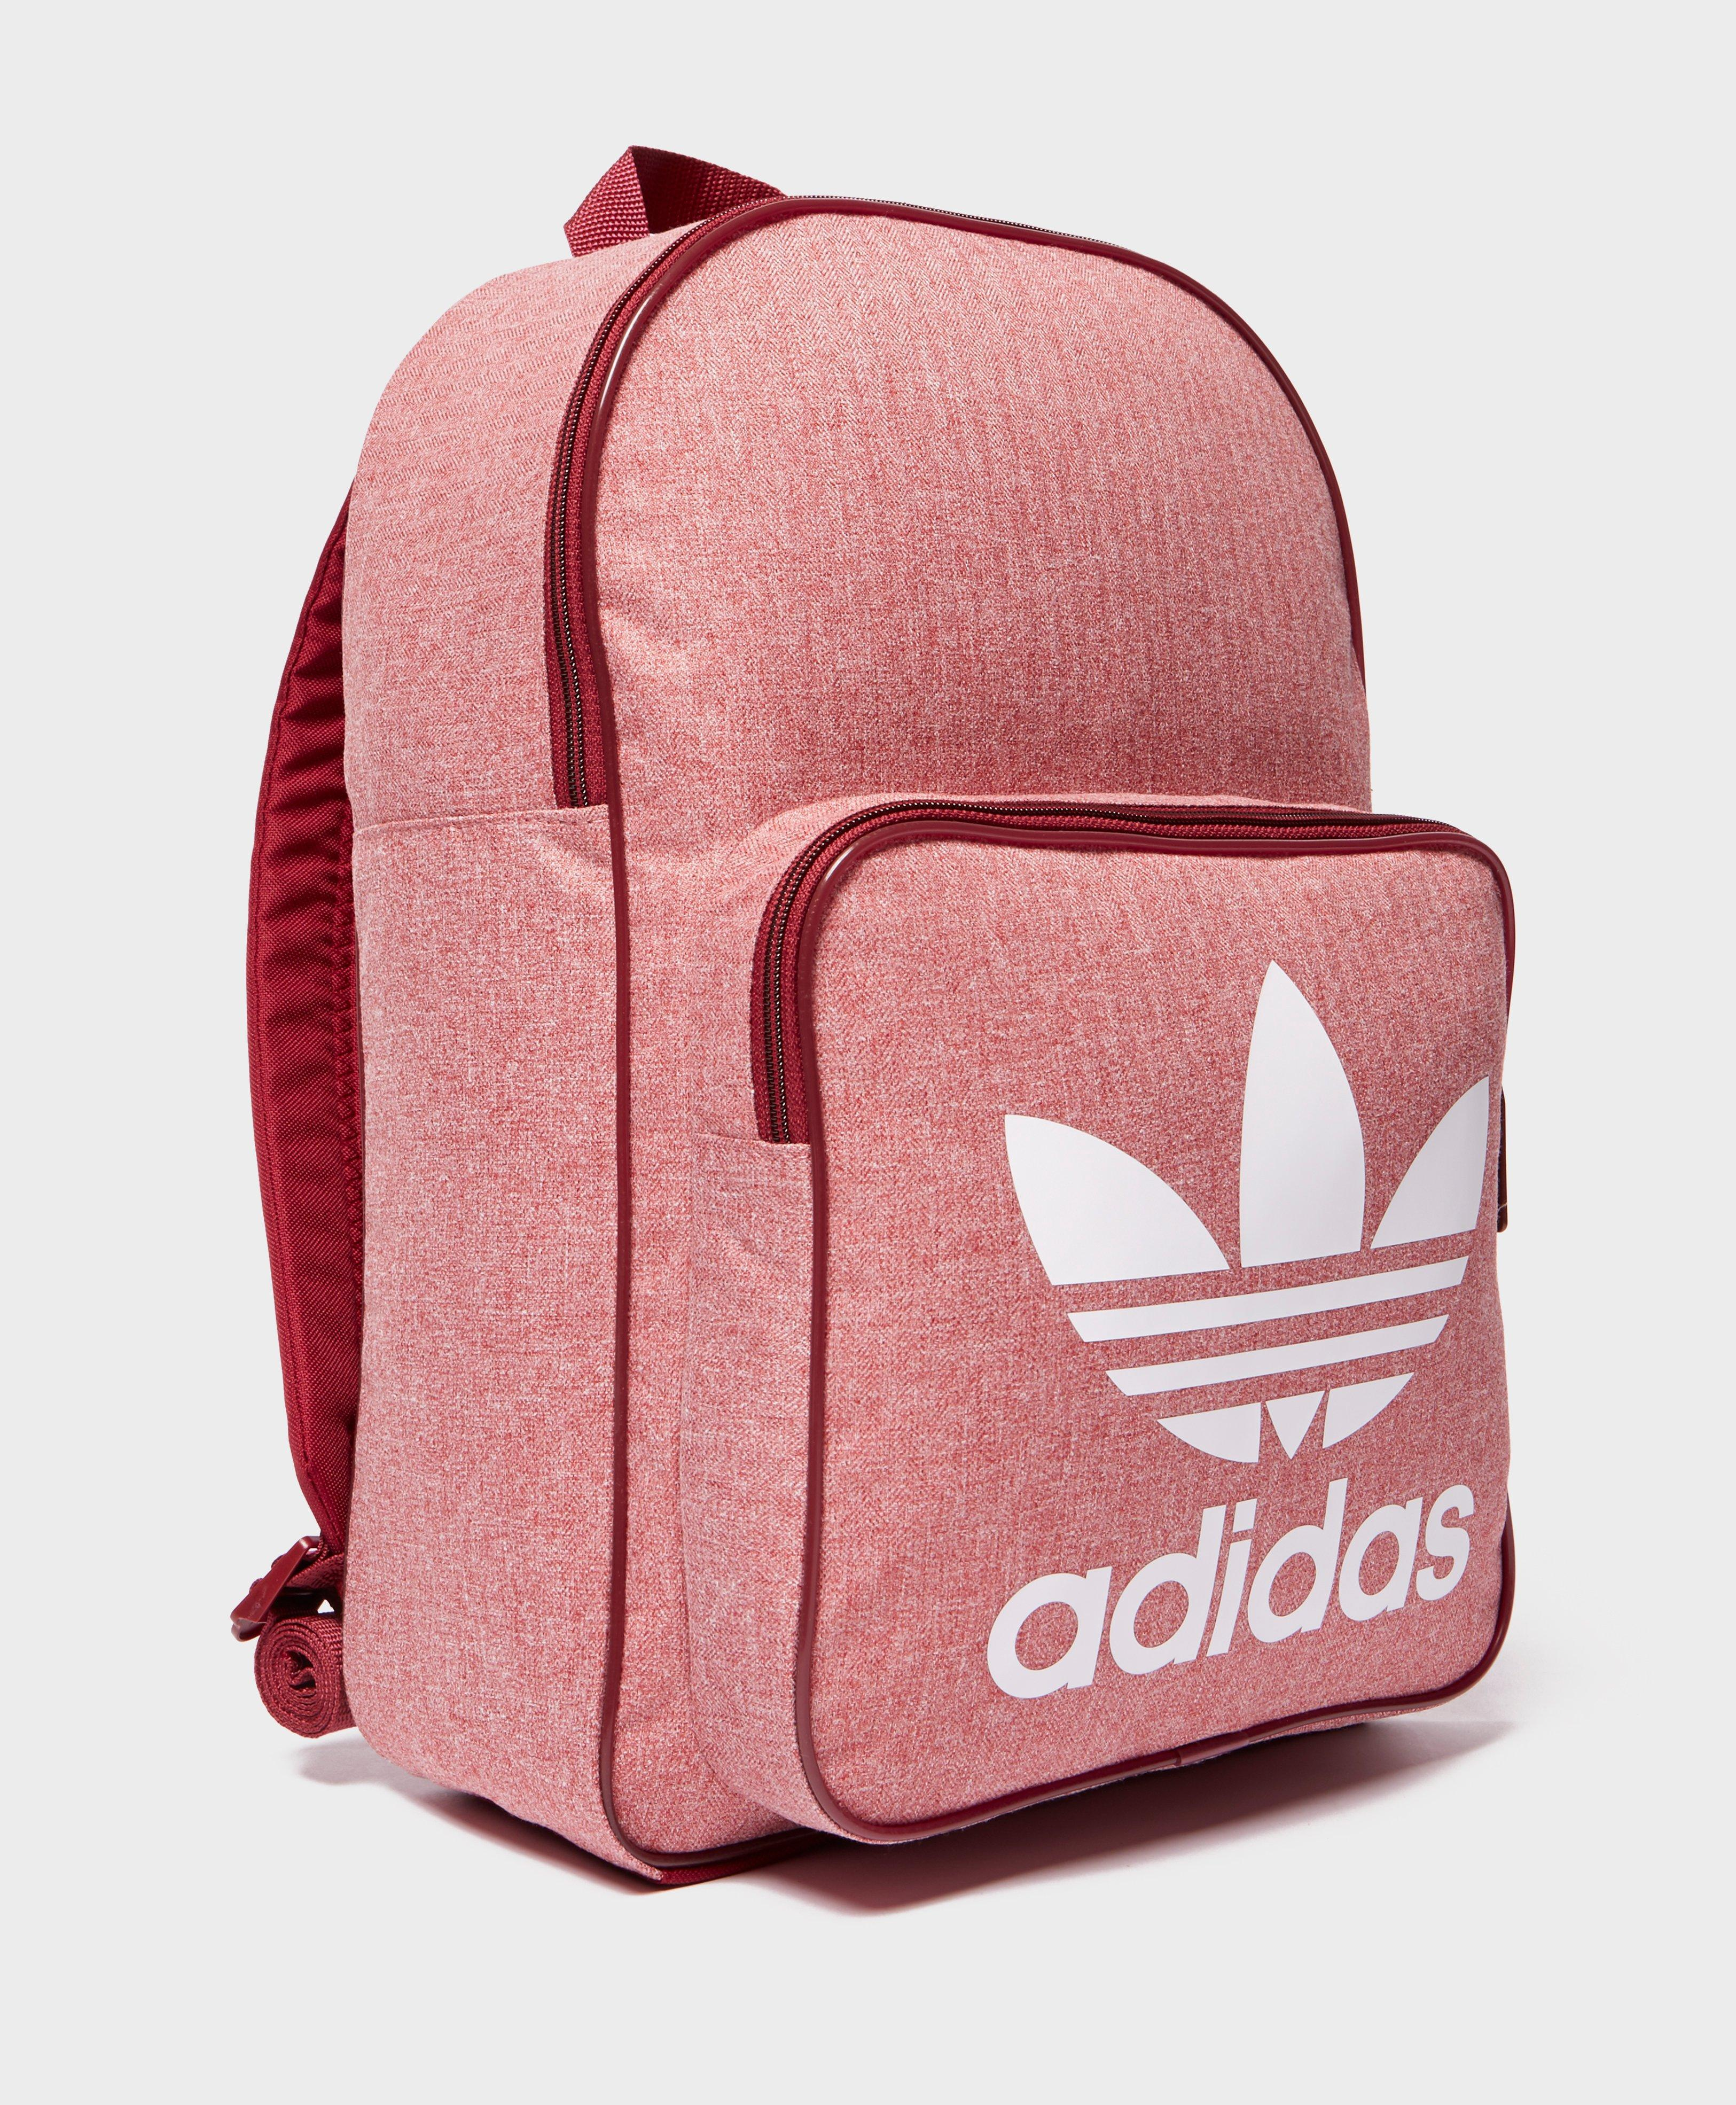 ac5cf369805a Adidas Originals Classic Trefoil Backpack Maroon- Fenix Toulouse ...